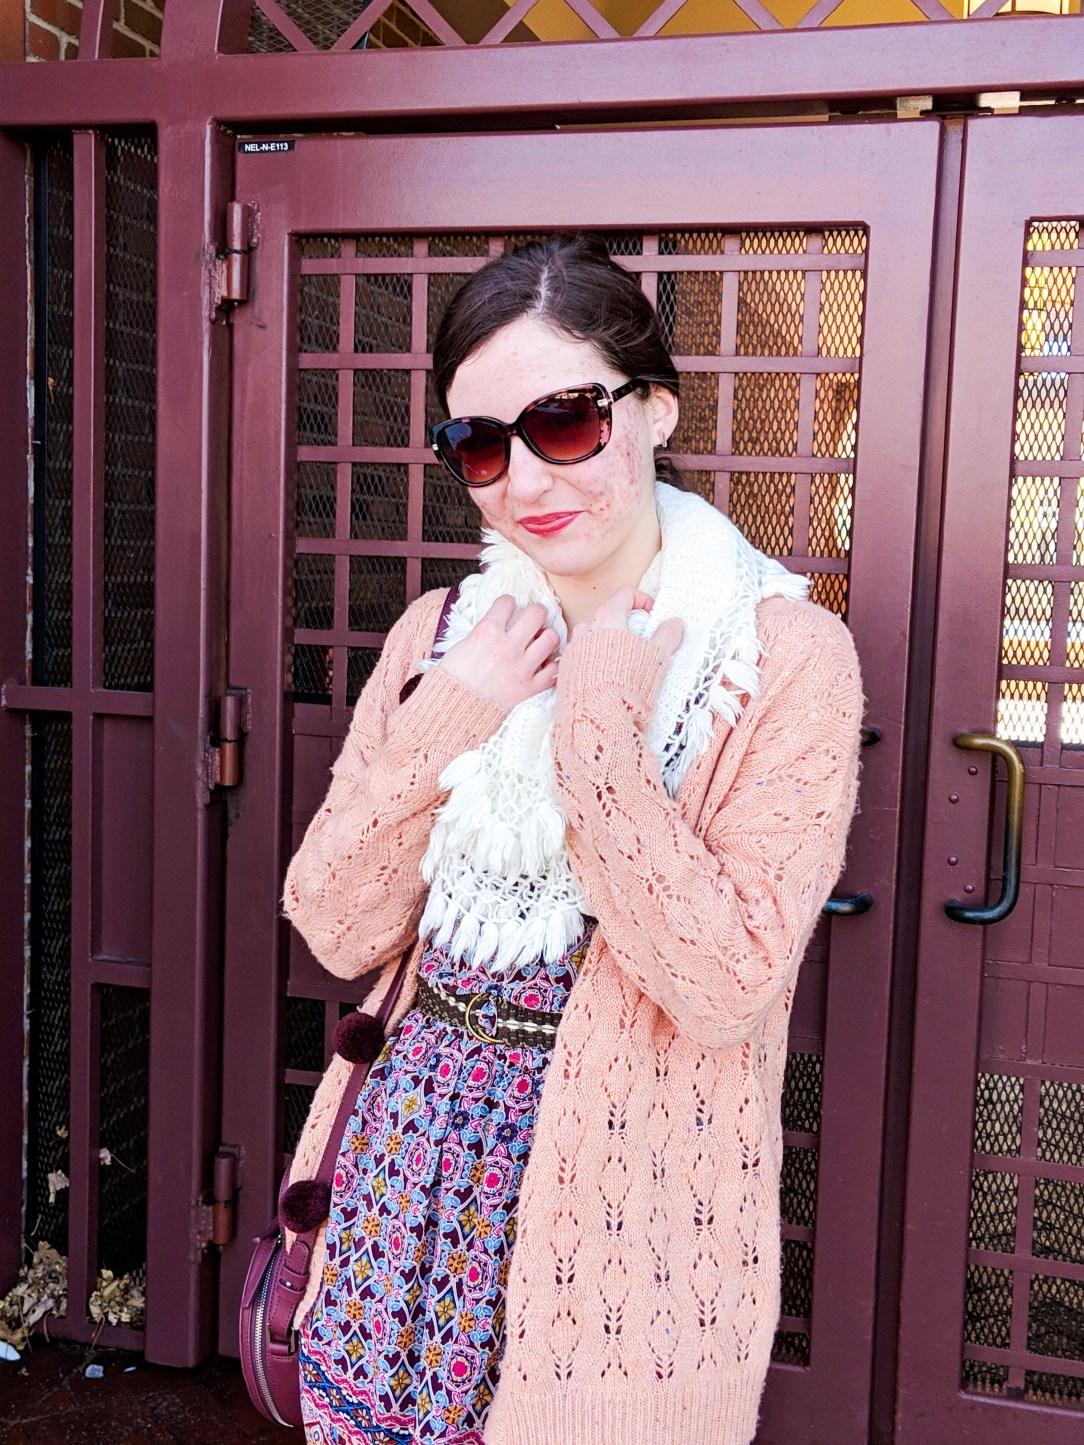 loft tortoise sunglasses, coral sweater